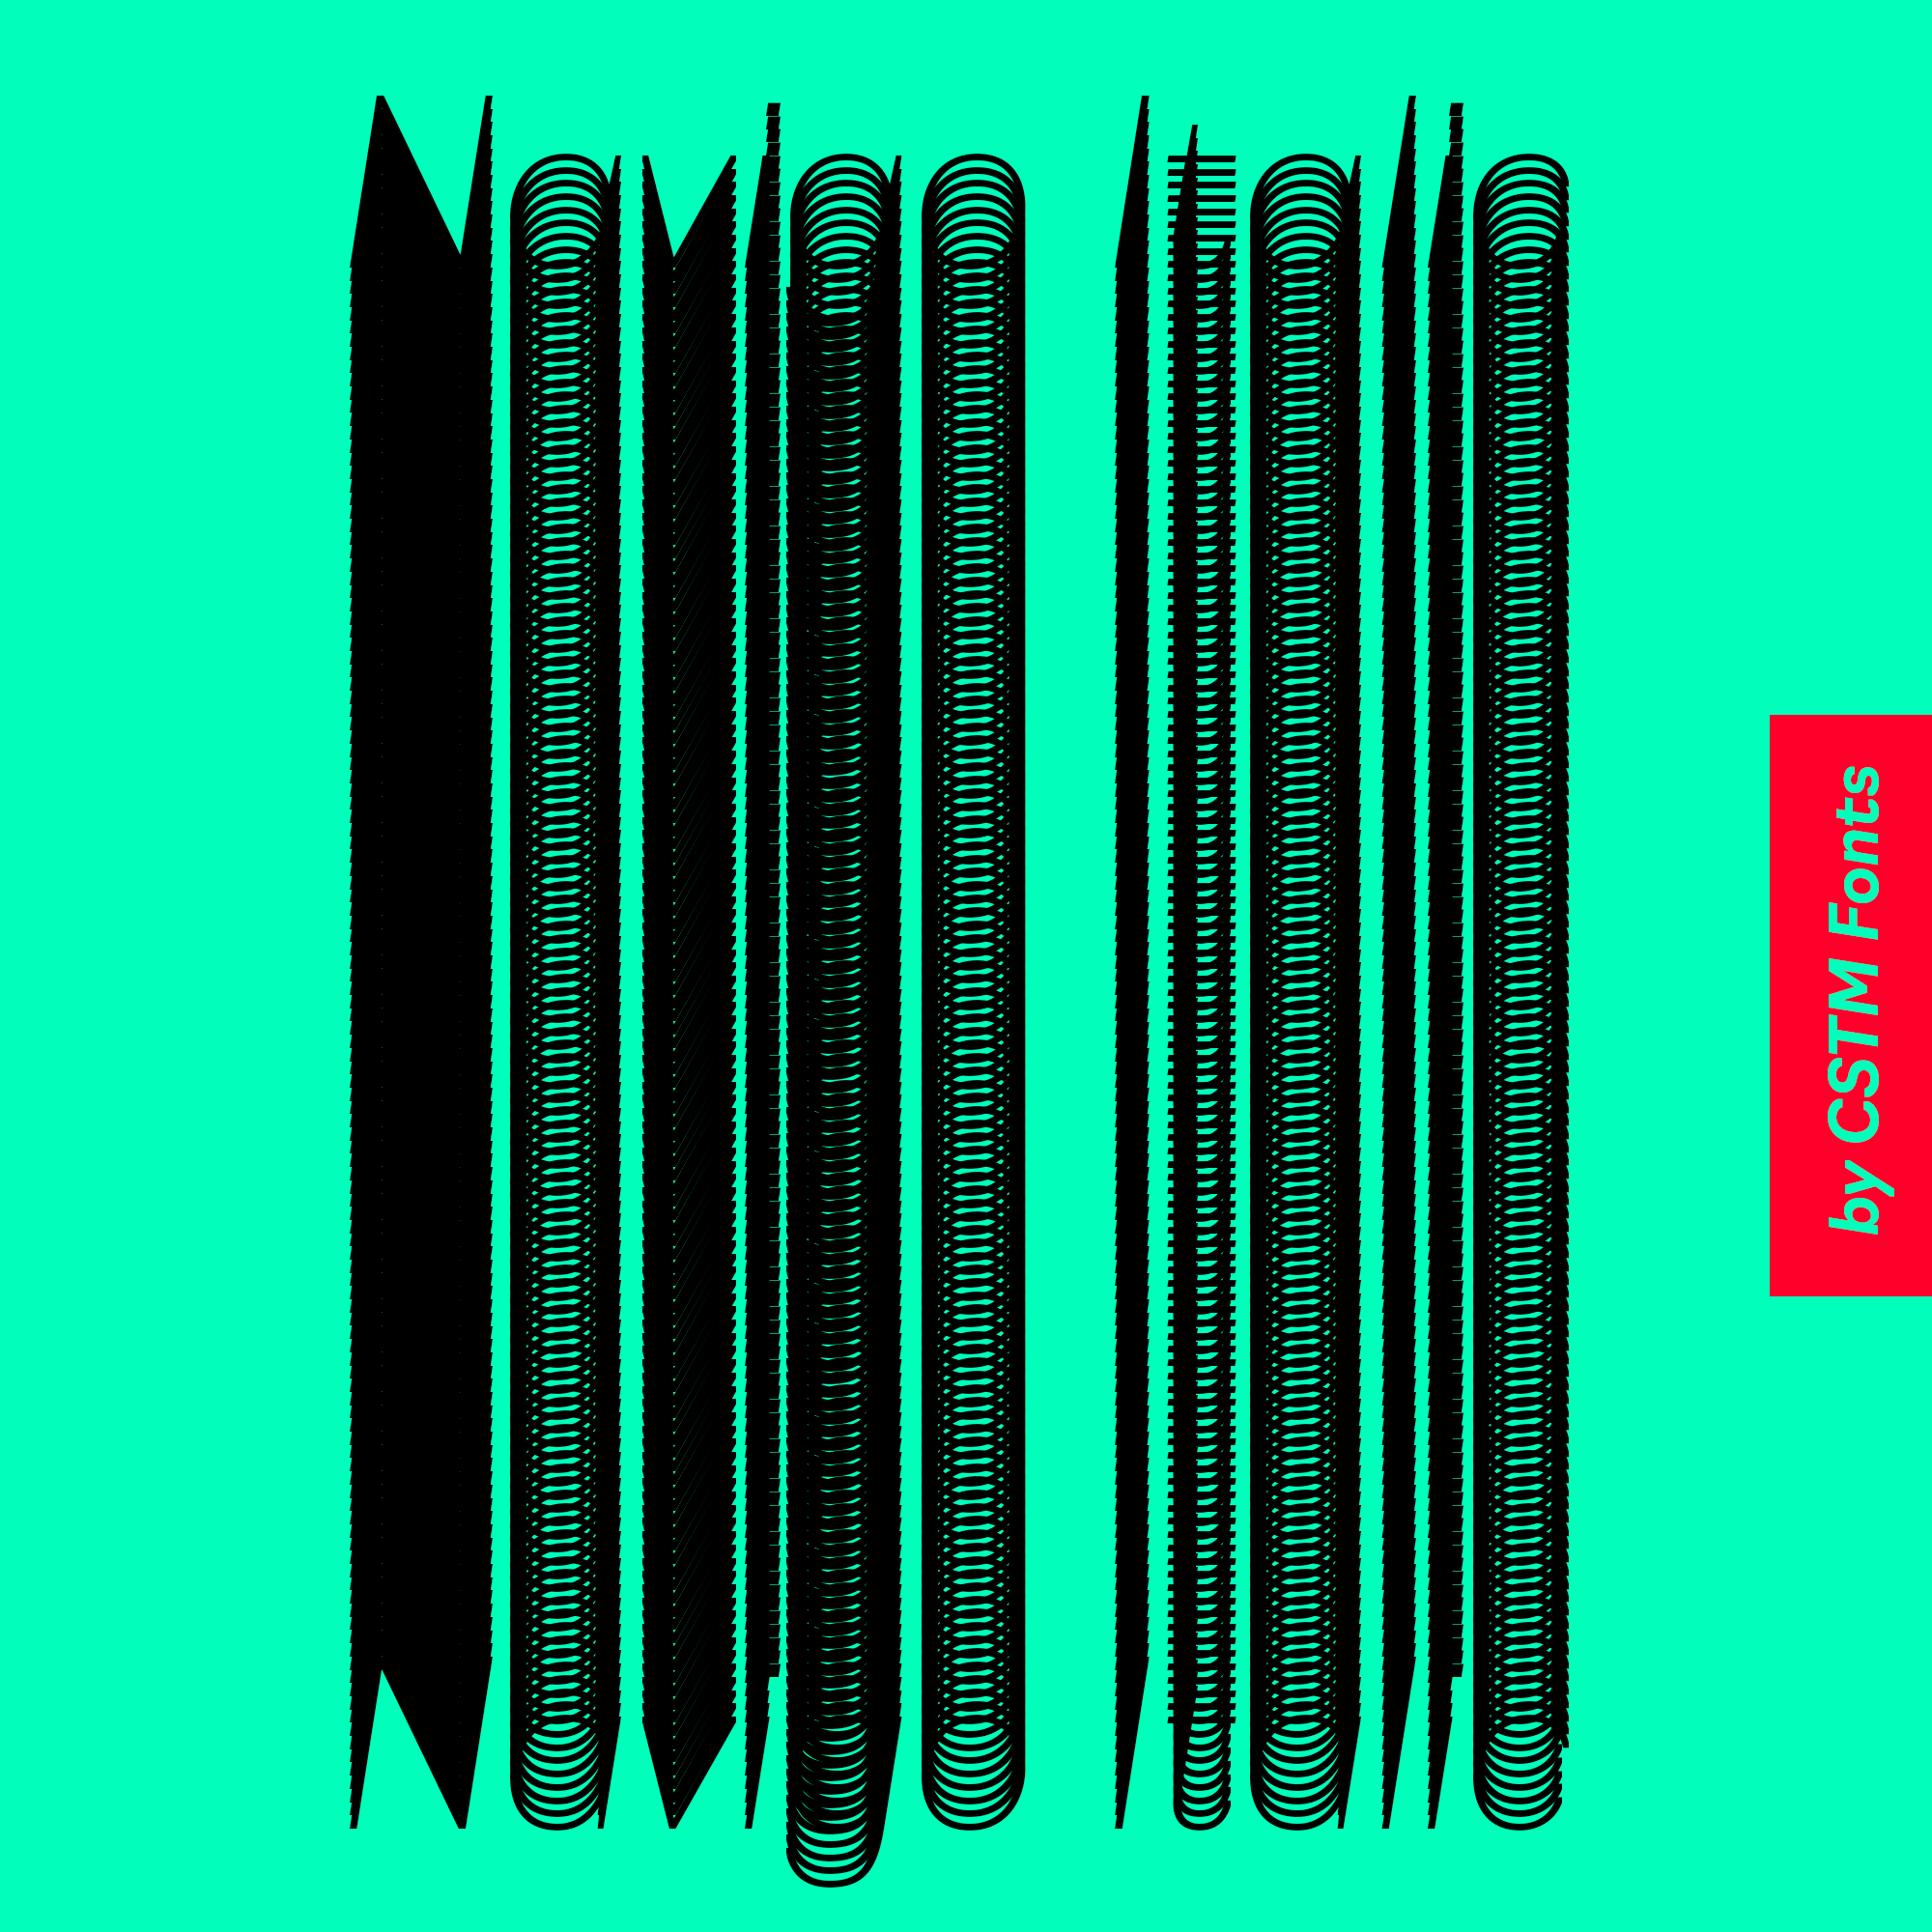 NavigoItalic_06